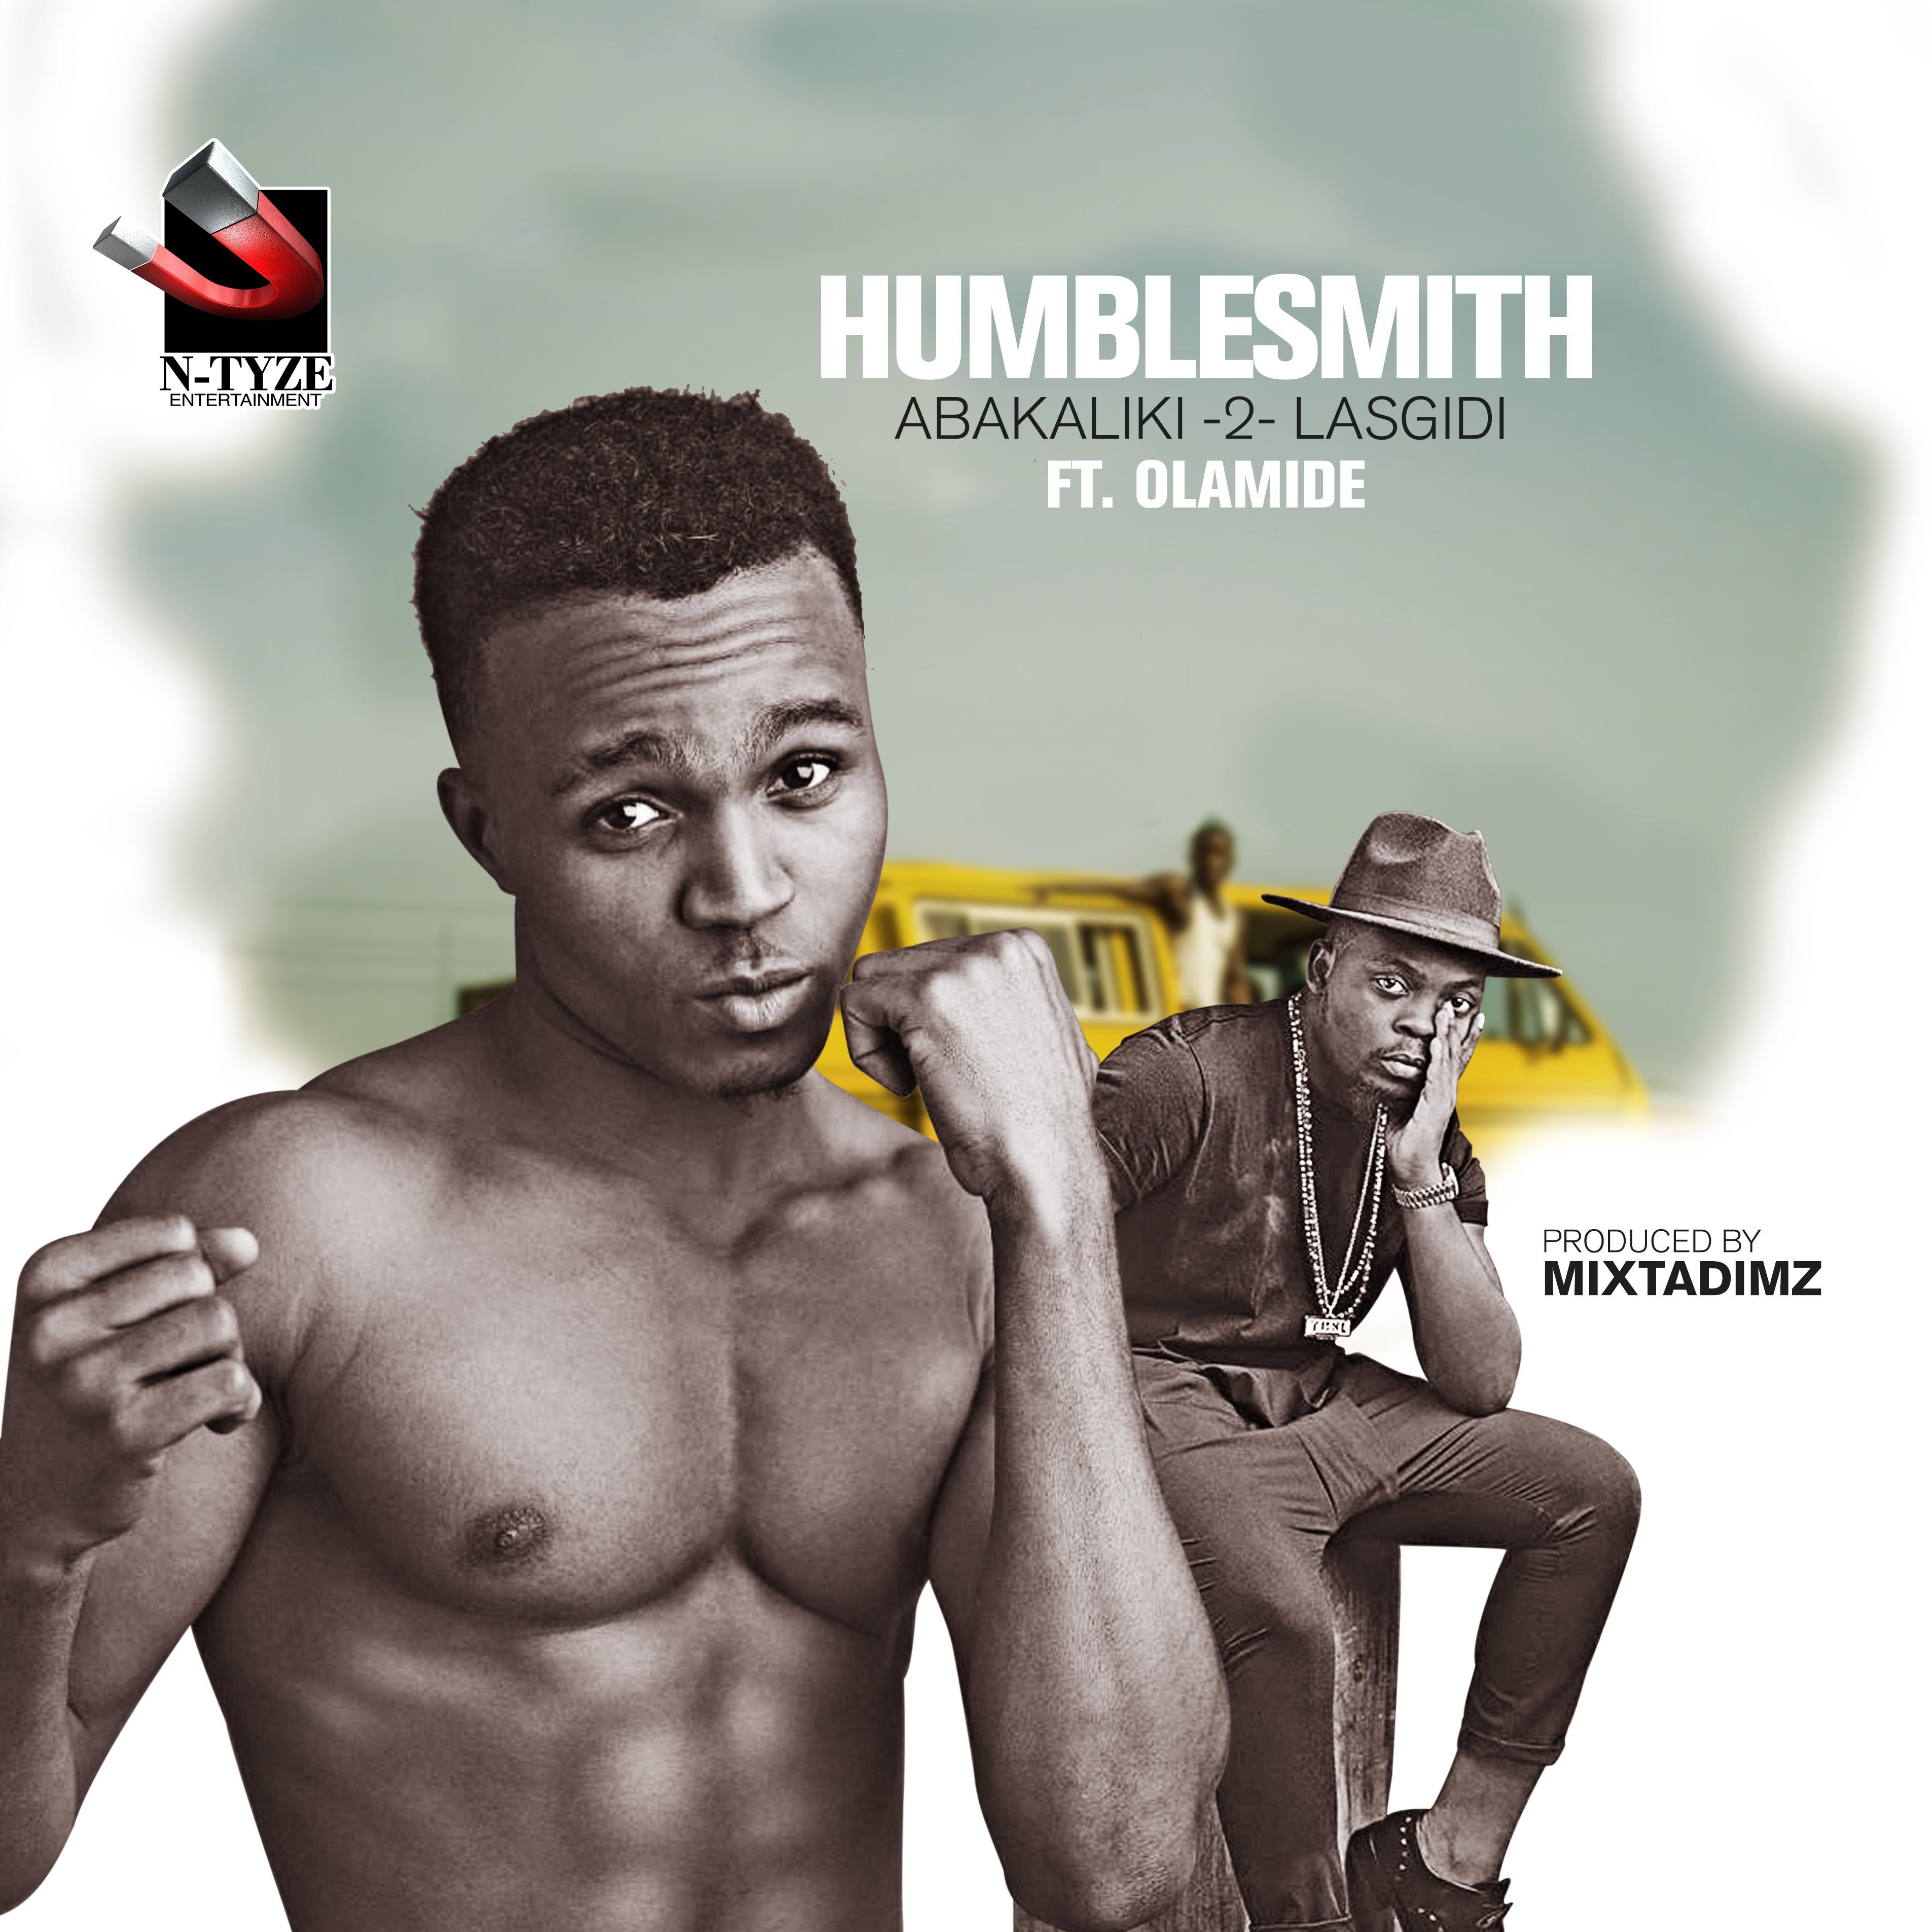 Humblesmith ft. Olamide - Abakaliki 2 Lasgidi